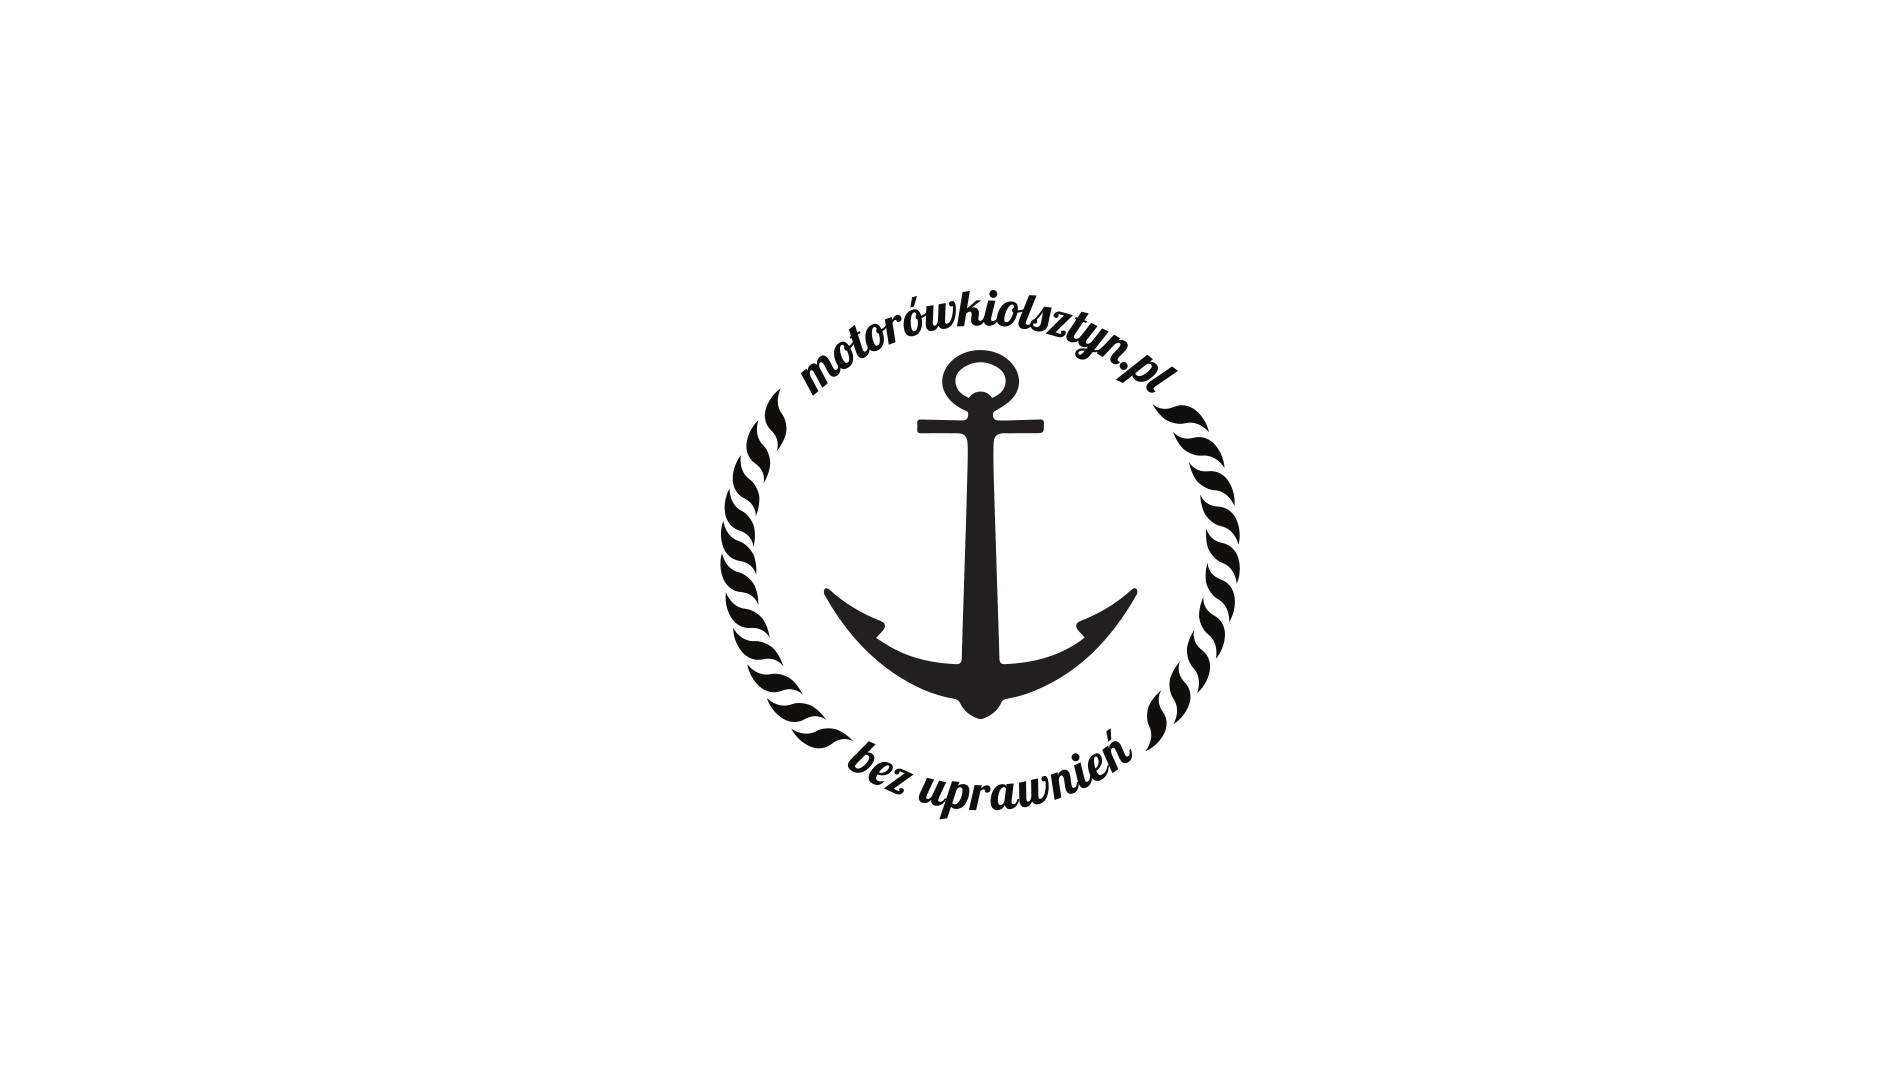 http://m.wm.pl/2019/04/orig/moto-bez-uprawnien-logo-543472.jpg